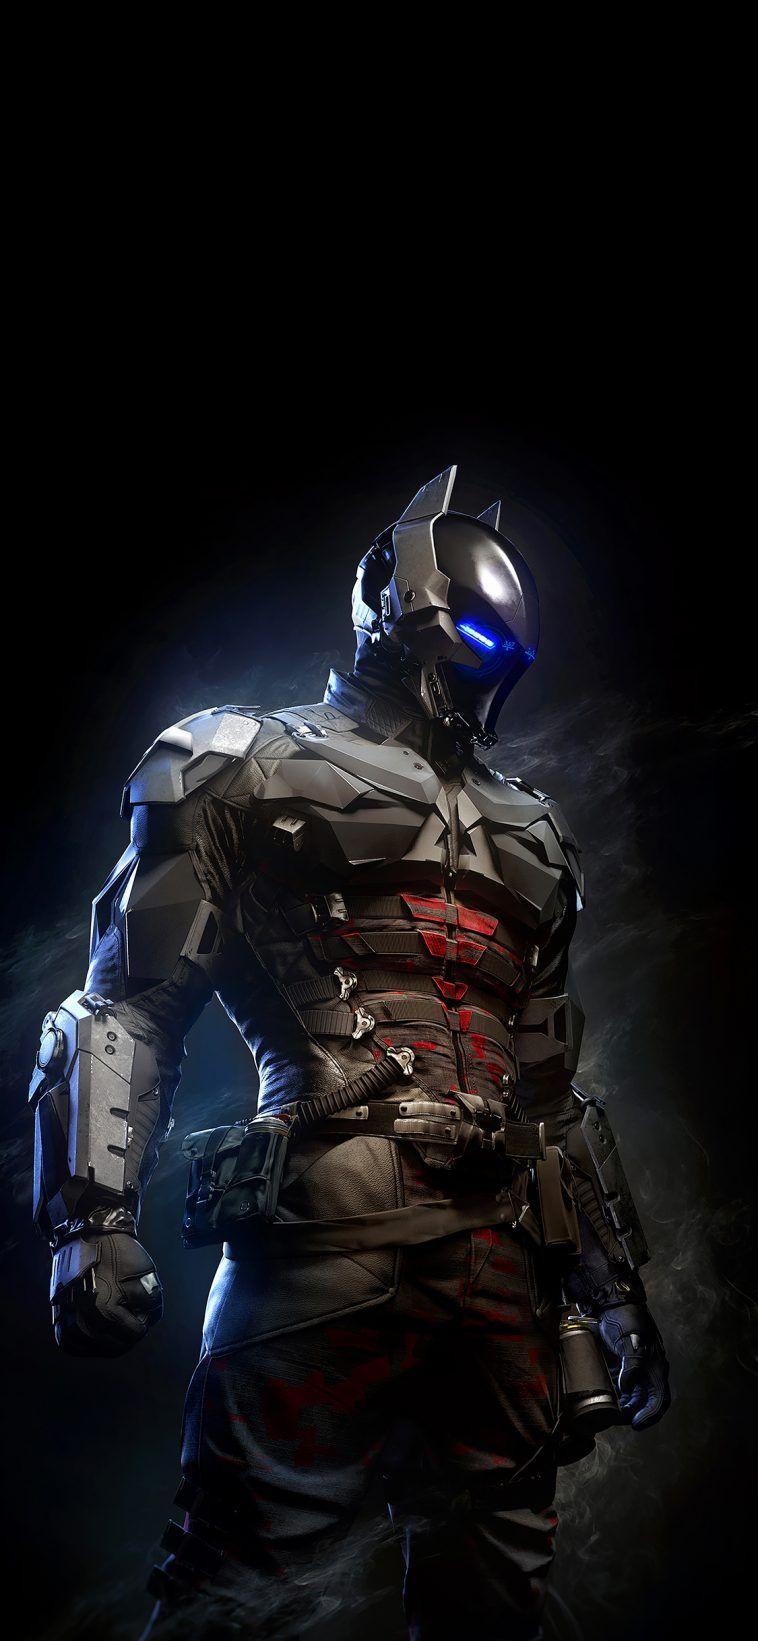 Dark Batman Wallpaper Backgrounds Cool Batman Wallpaper